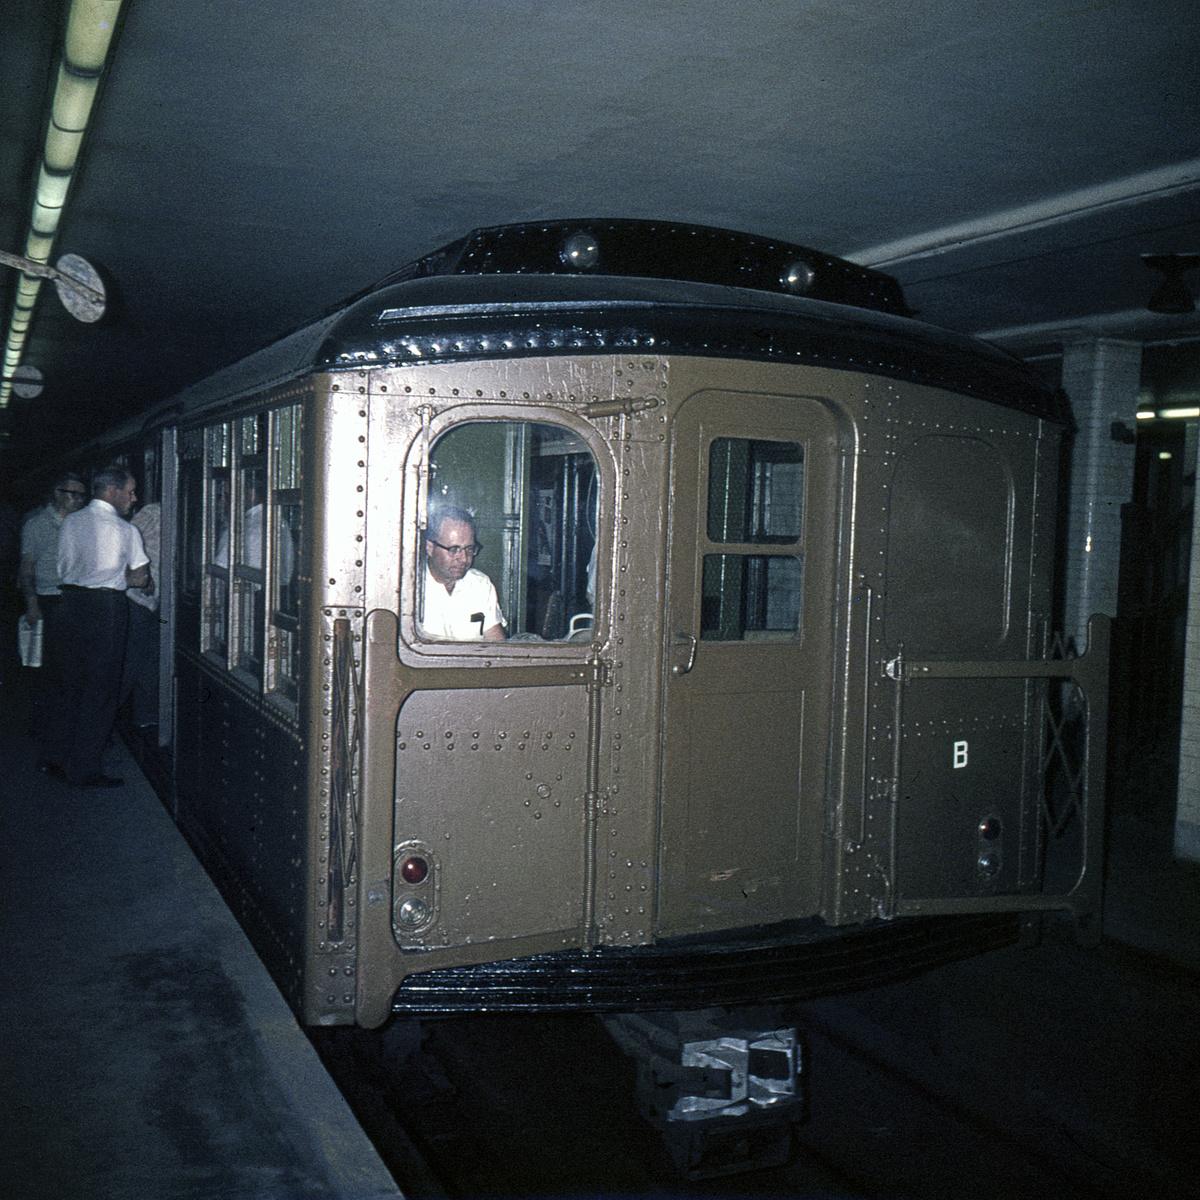 (739k, 1200x1200)<br><b>Country:</b> United States<br><b>City:</b> New York<br><b>System:</b> New York City Transit<br><b>Line:</b> BMT Nassau Street-Jamaica Line<br><b>Location:</b> Chambers Street<br><b>Route:</b> Fan Trip<br><b>Car:</b> BMT A/B-Type Standard 2390 <br><b>Collection of:</b> David Pirmann<br><b>Date:</b> 7/22/1965<br><b>Viewed (this week/total):</b> 0 / 4349